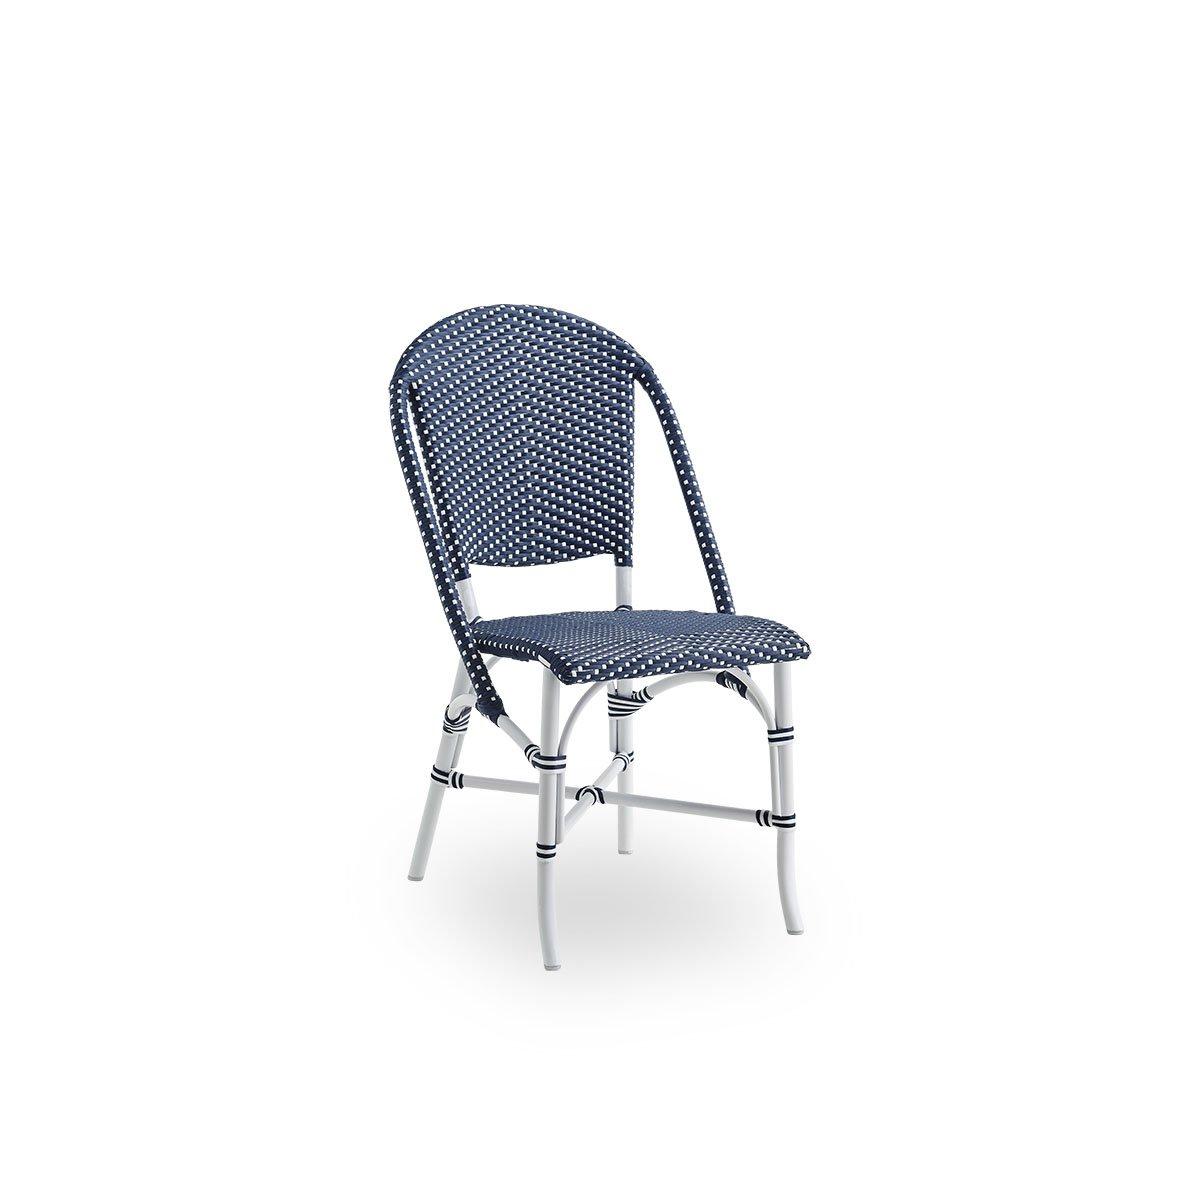 Sika Design Gartenstuhl Sofie Navy Blue